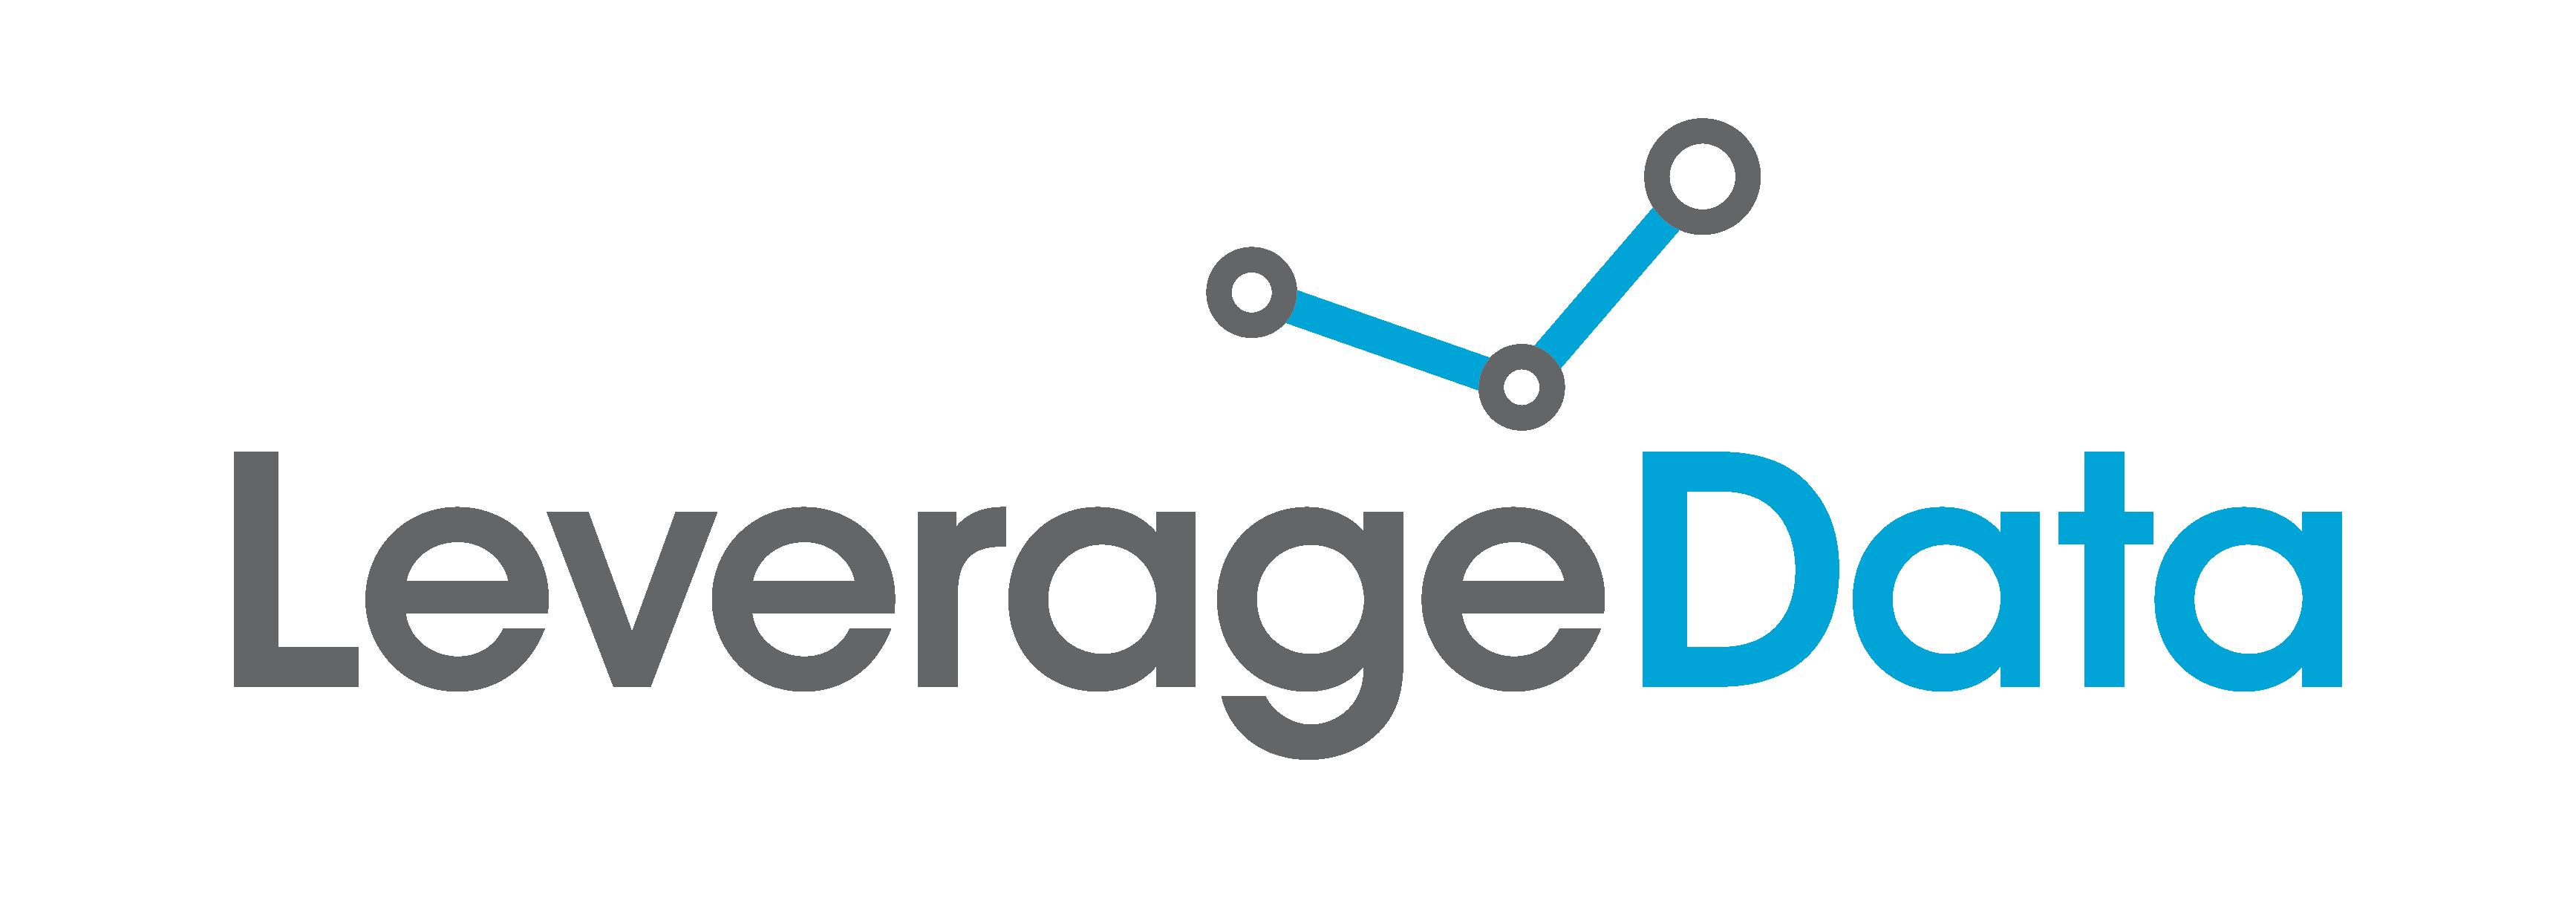 LeverageData GmbH